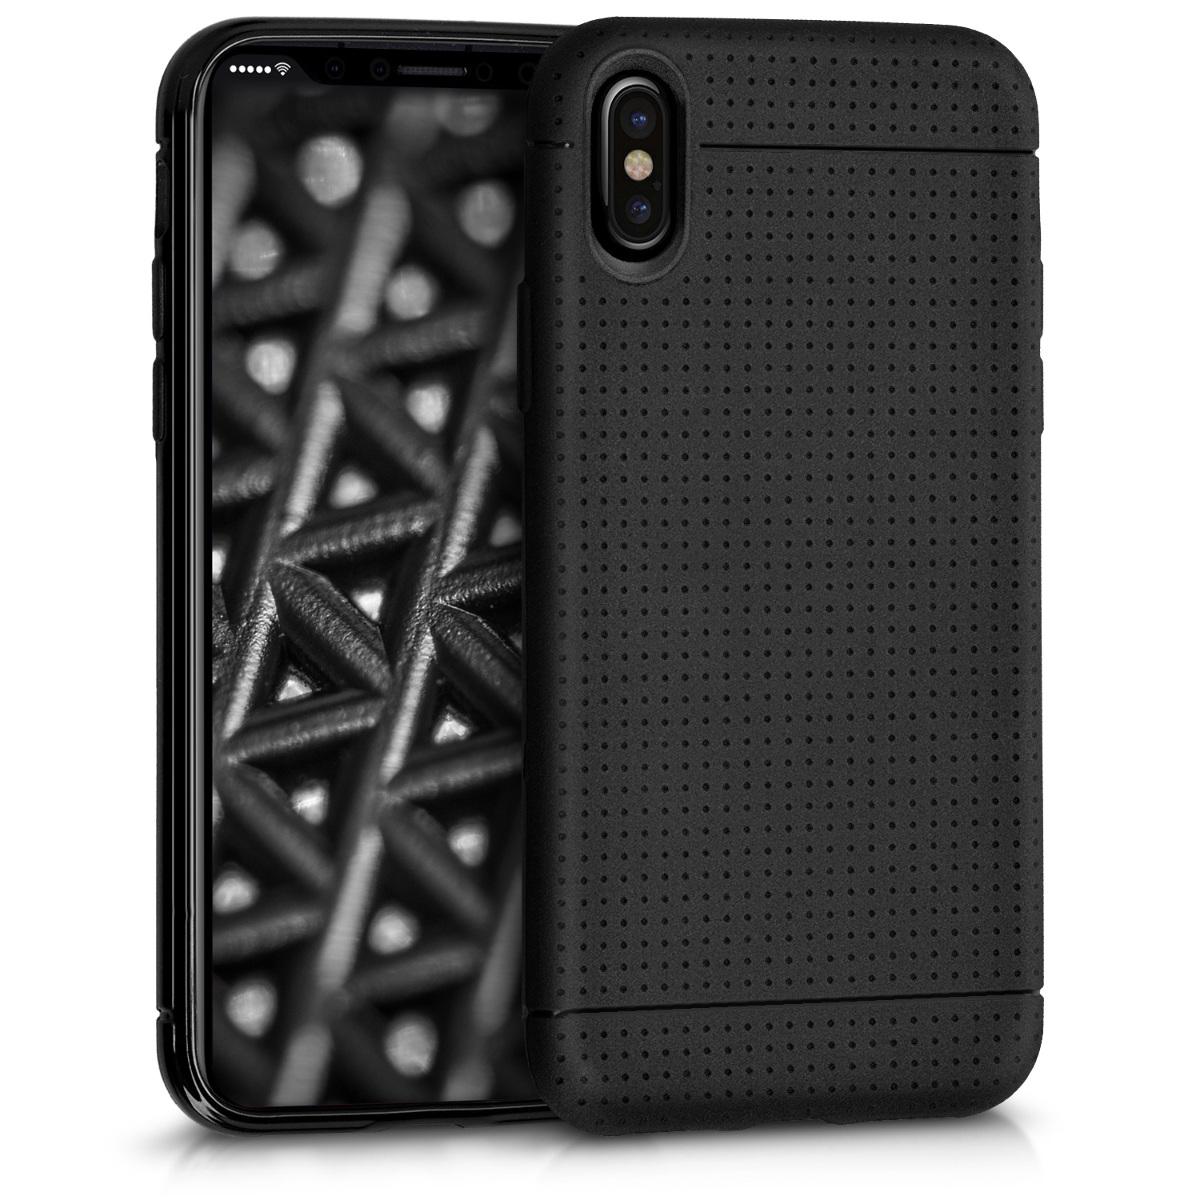 Kvalitní silikonové TPU pouzdro pro Apple iPhone X - Dot Matrix Black Matte